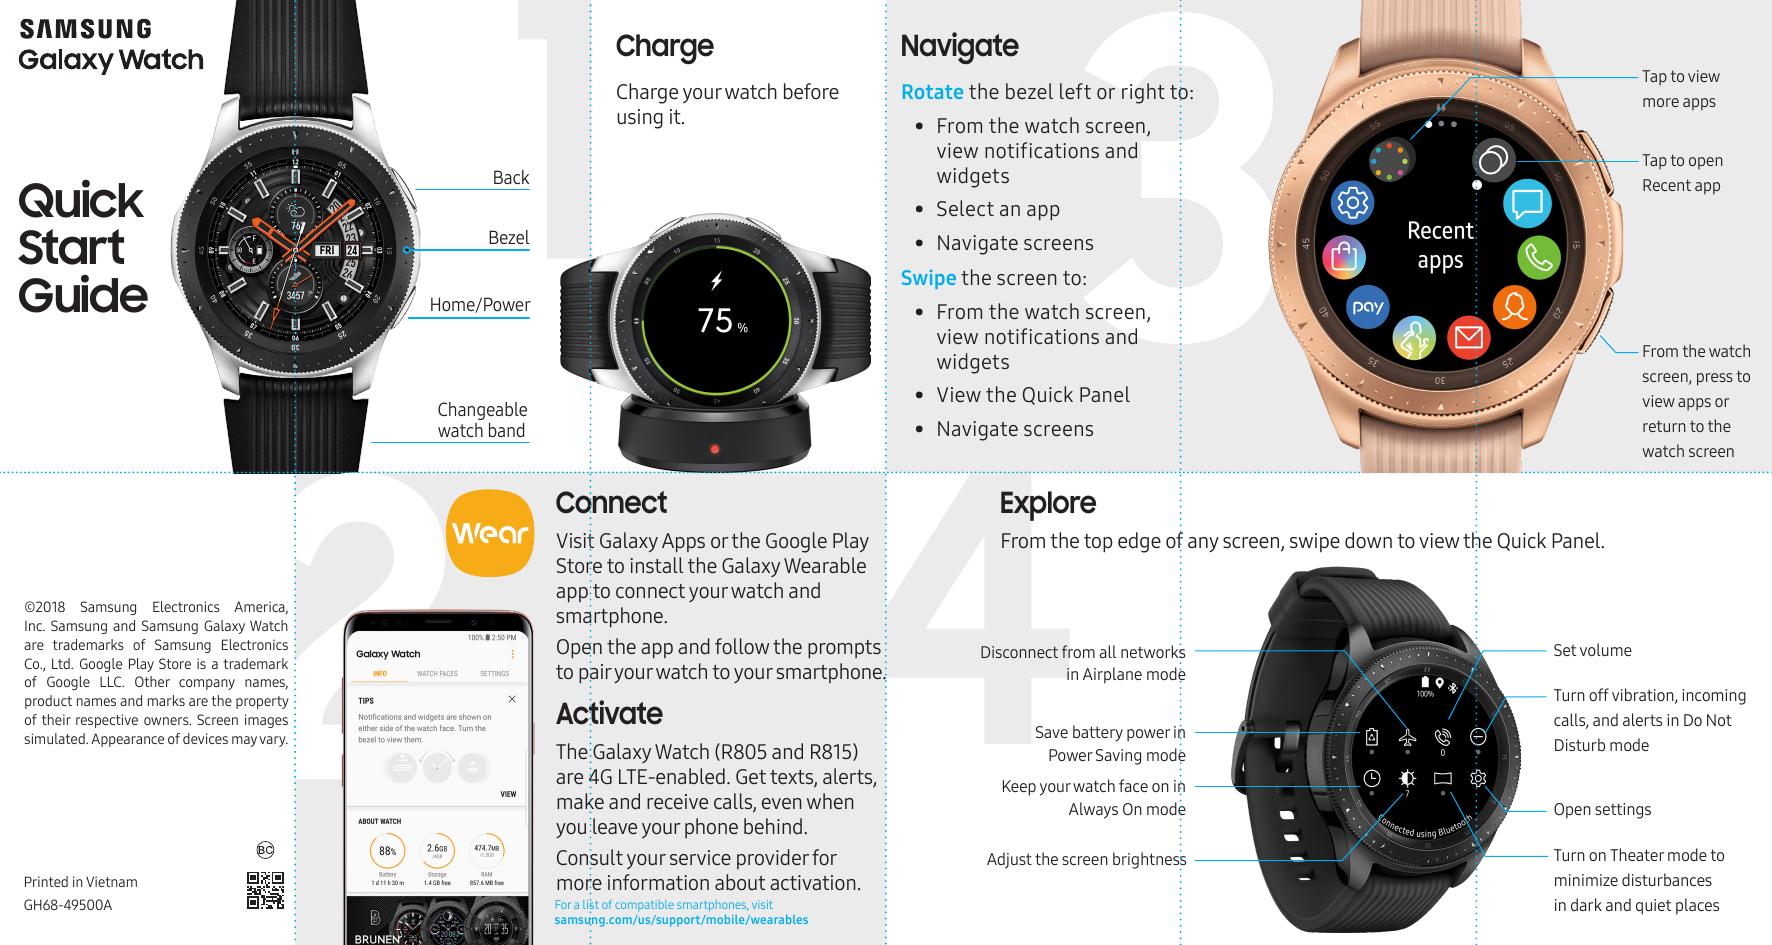 Samsung Galaxy Watch R800 Manual Manual Guide